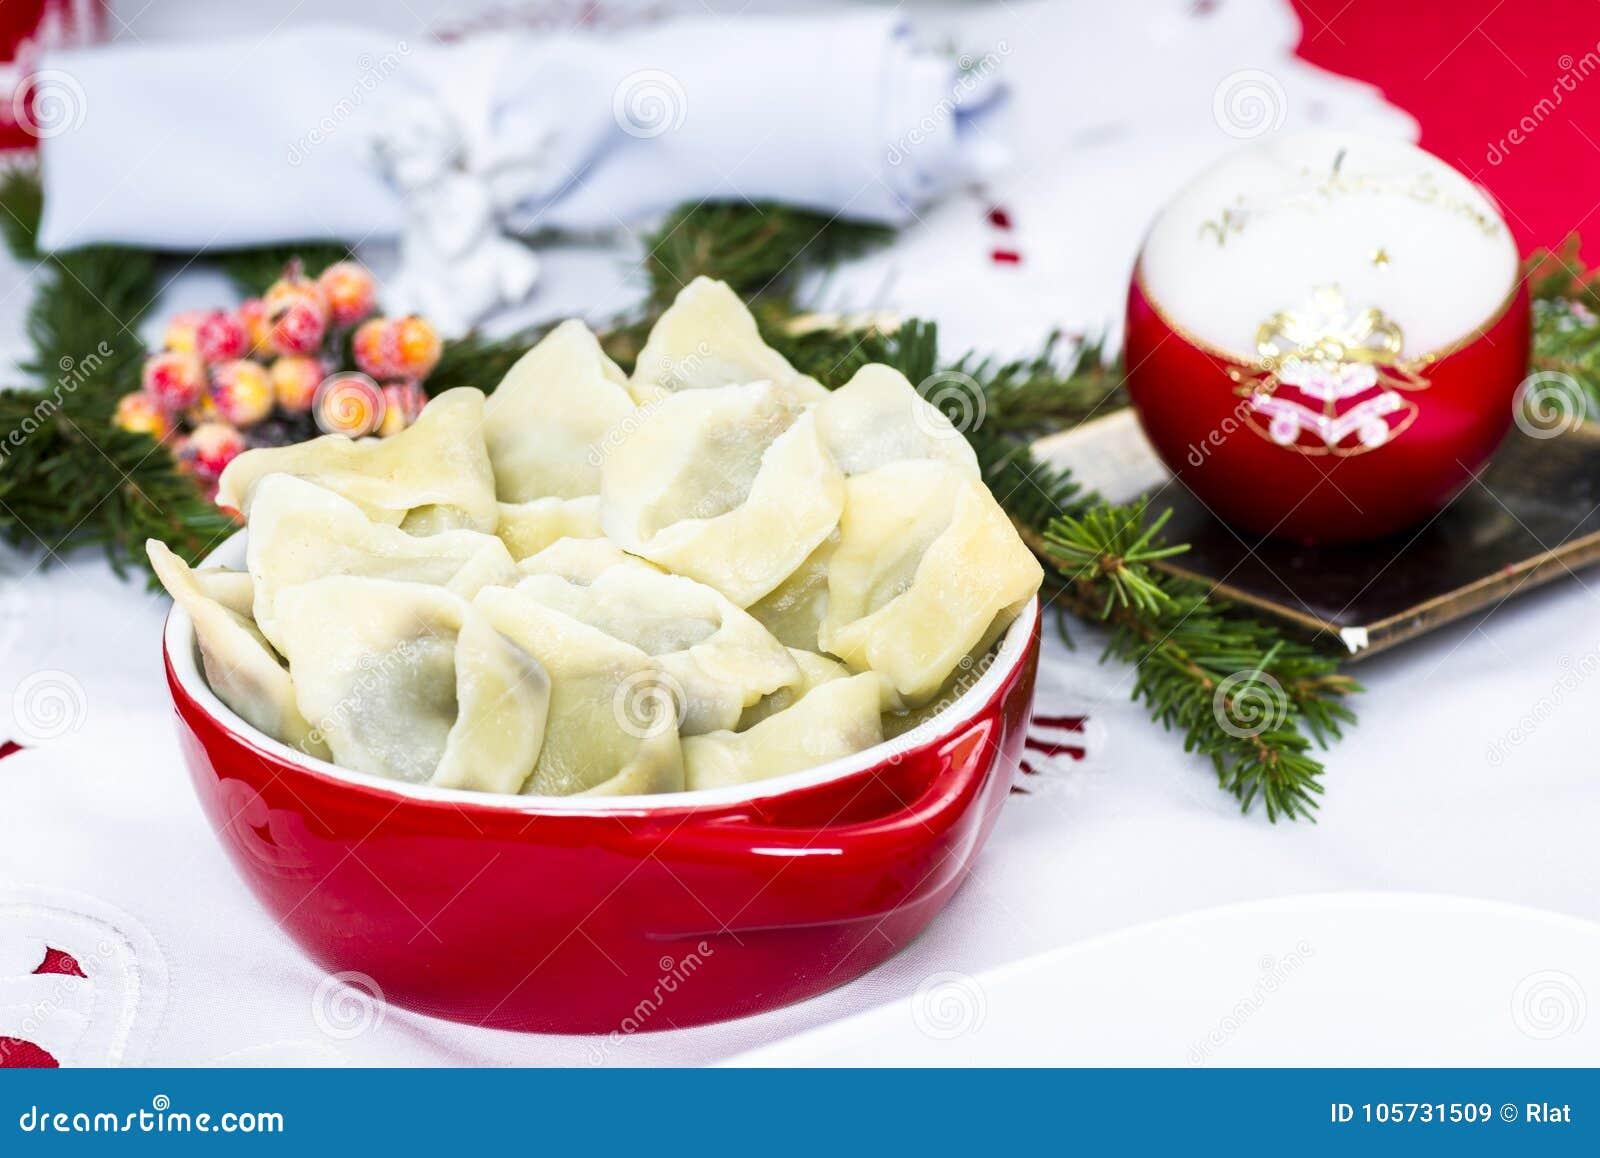 Borscht rosso con le polpette